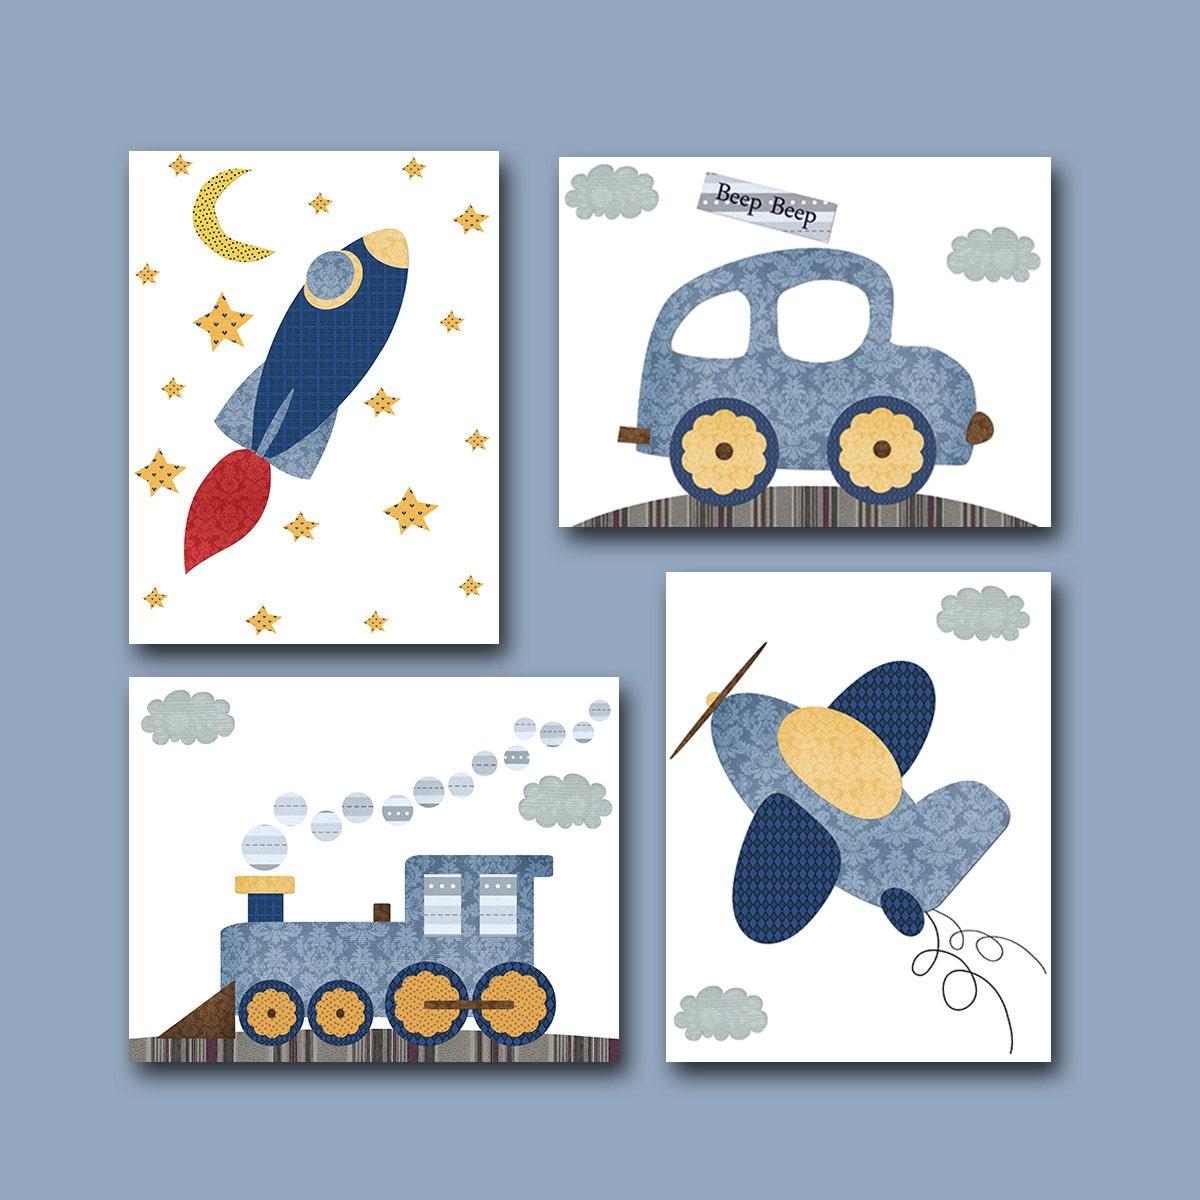 Boy S Room Airplane And Constellation Wall Map: Car Rocket Plane Train Baby Boy Nursery Decor Children Art